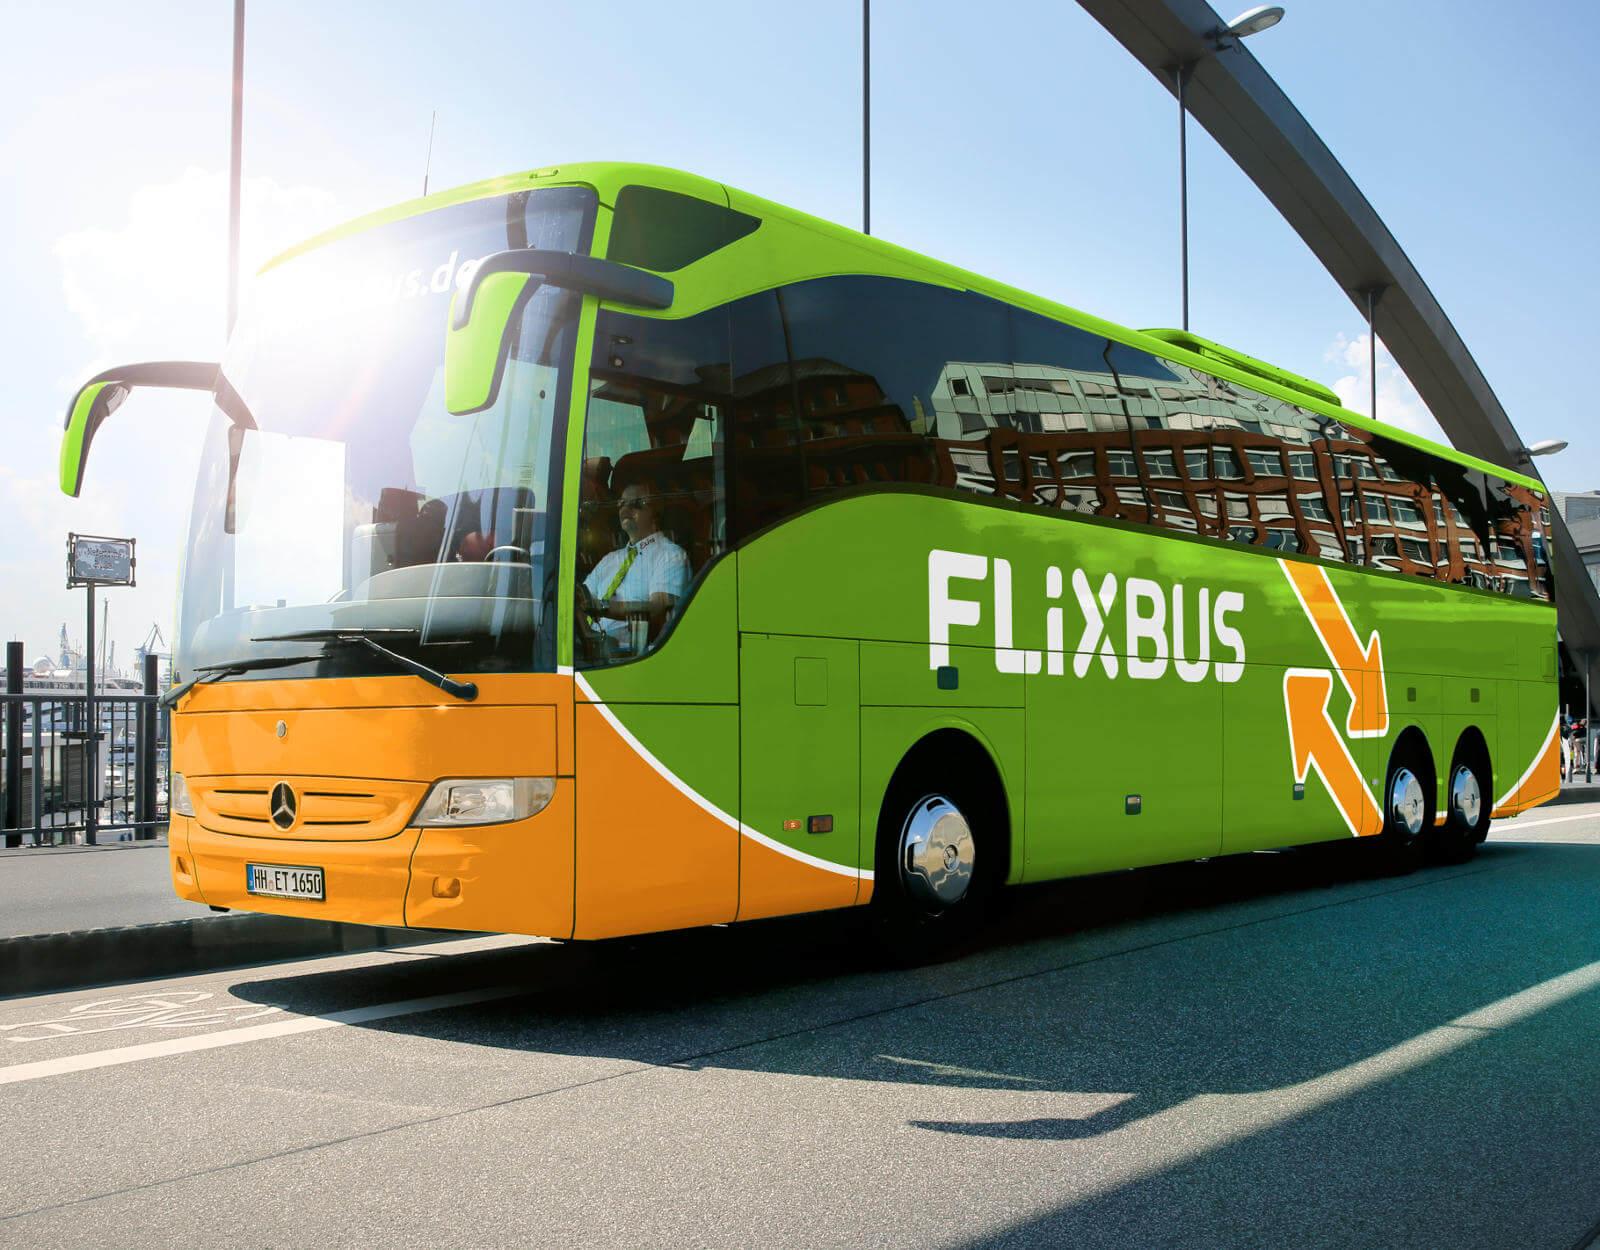 FlixBus - Find & Book Official FlixBus Bus Tickets | Busbud